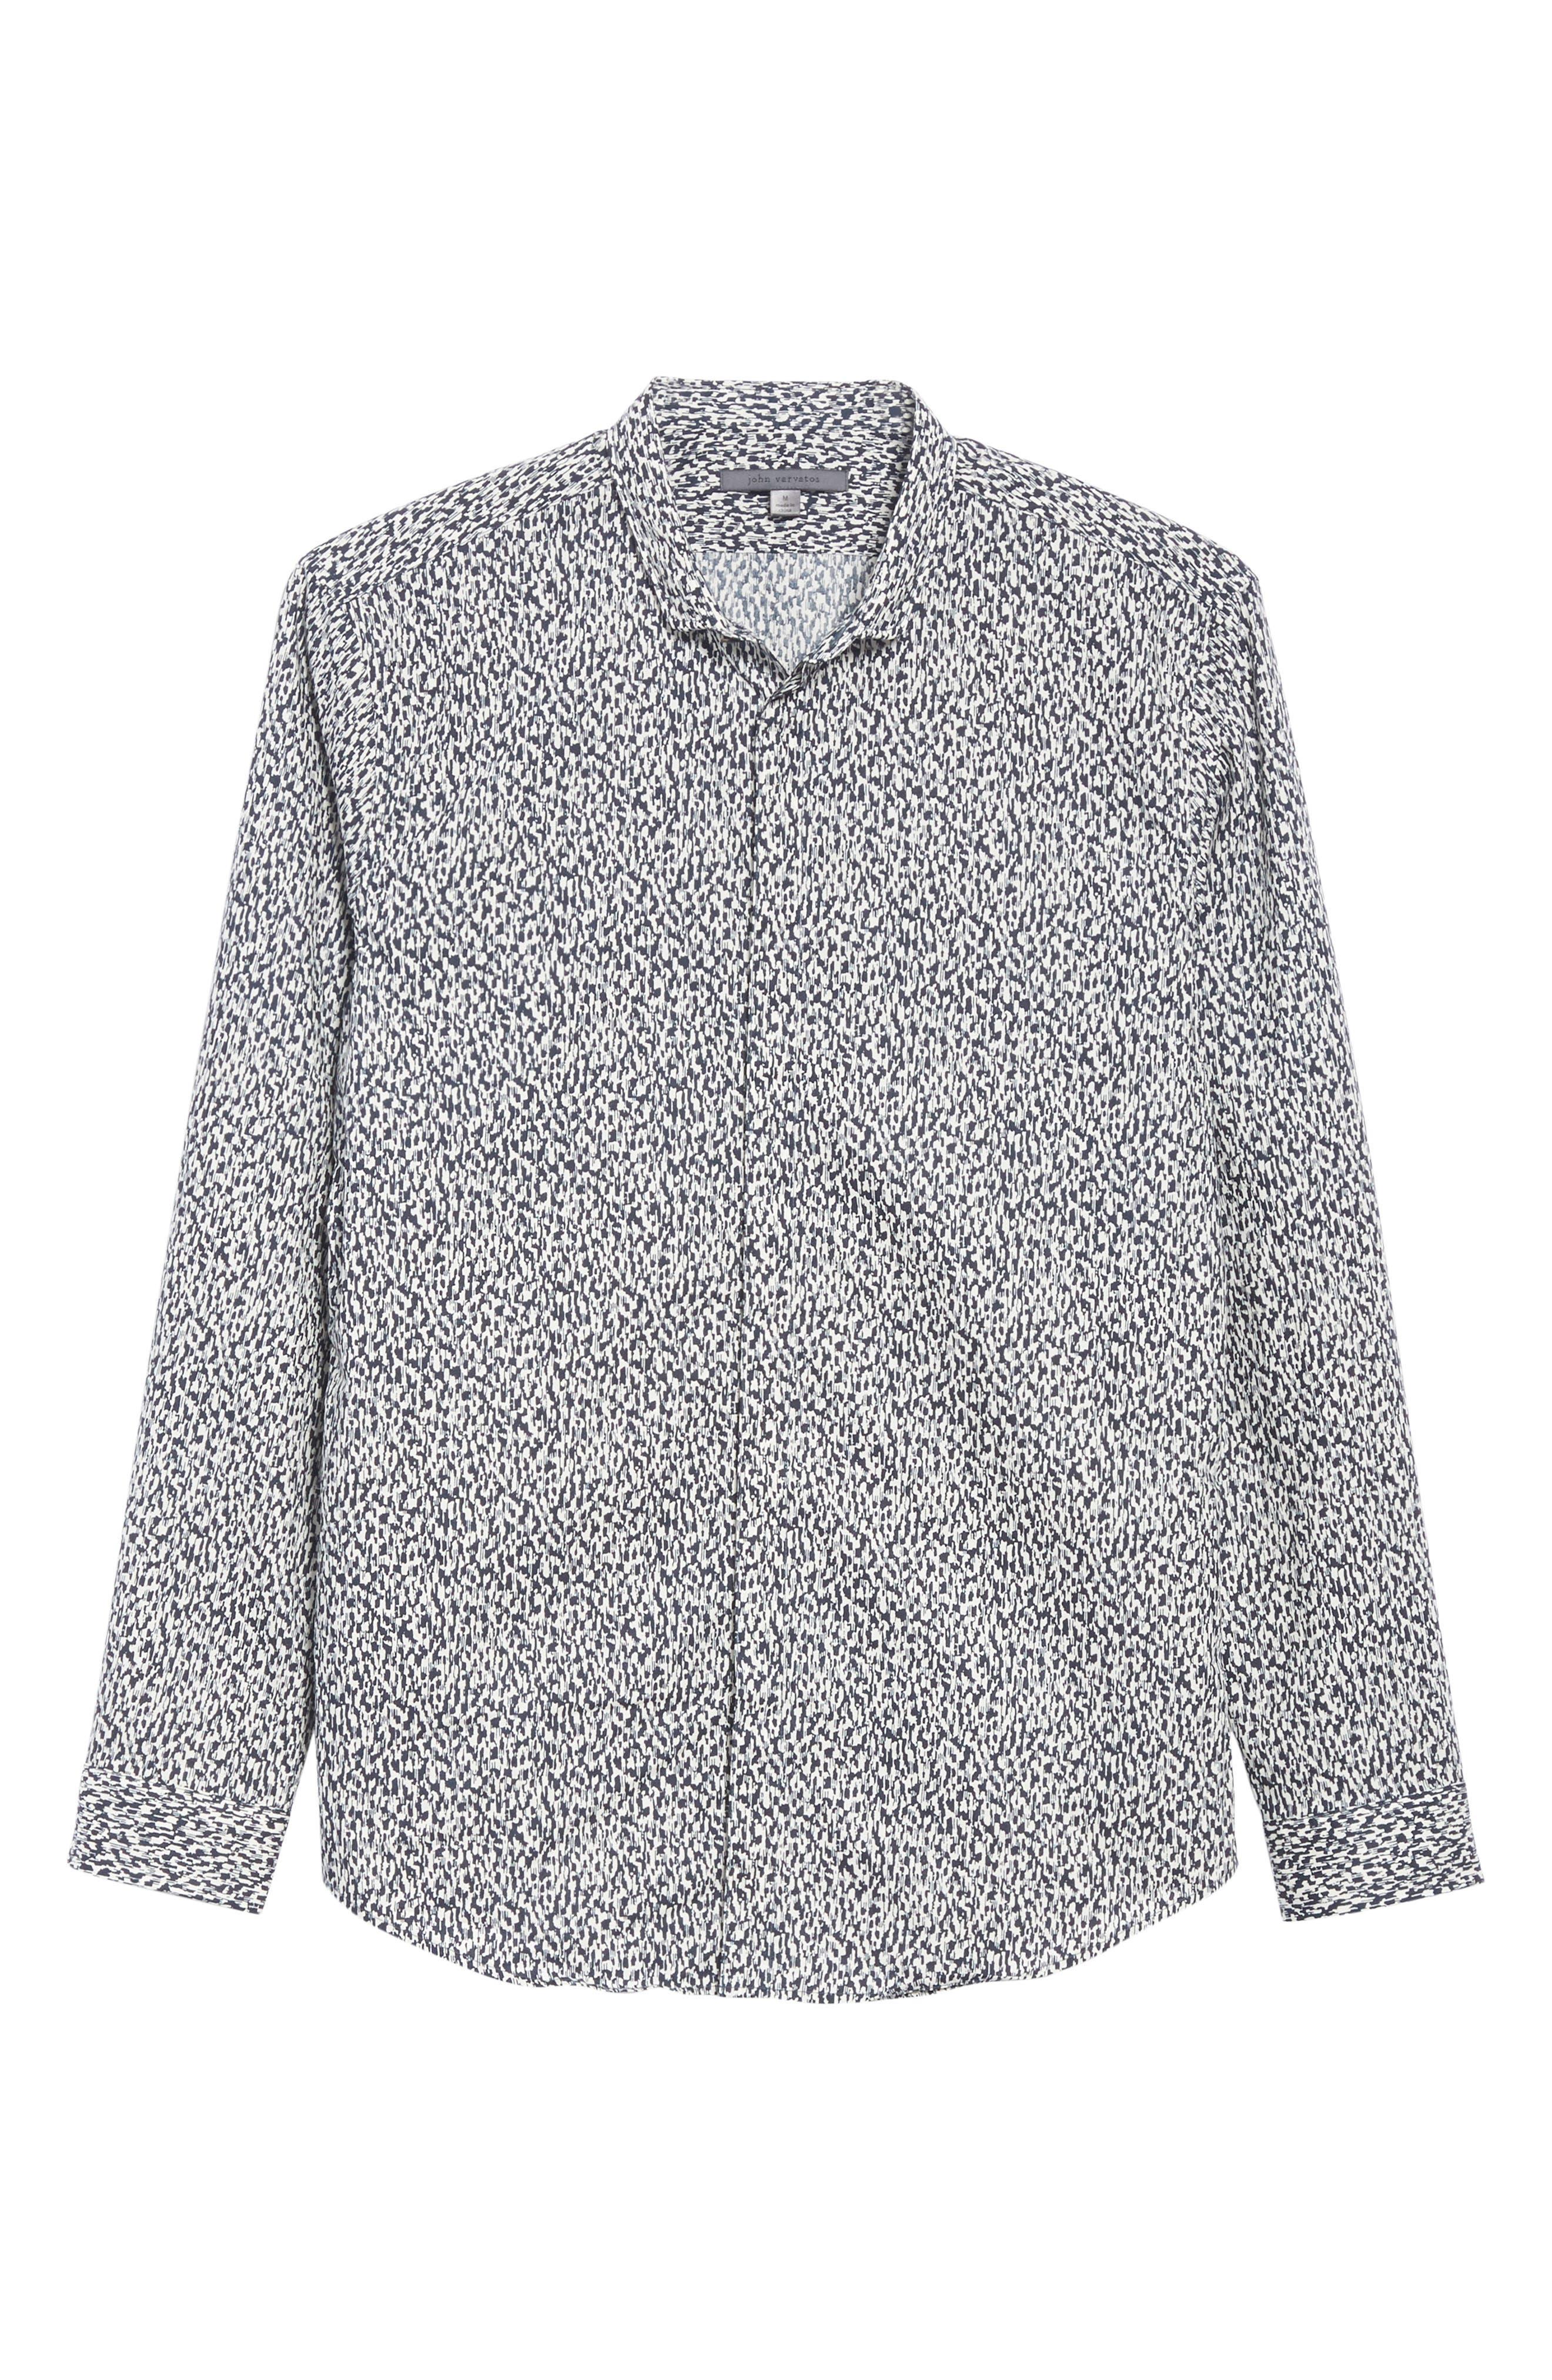 Slim Fit Print Sport Shirt,                             Alternate thumbnail 6, color,                             BLACK/WHITE